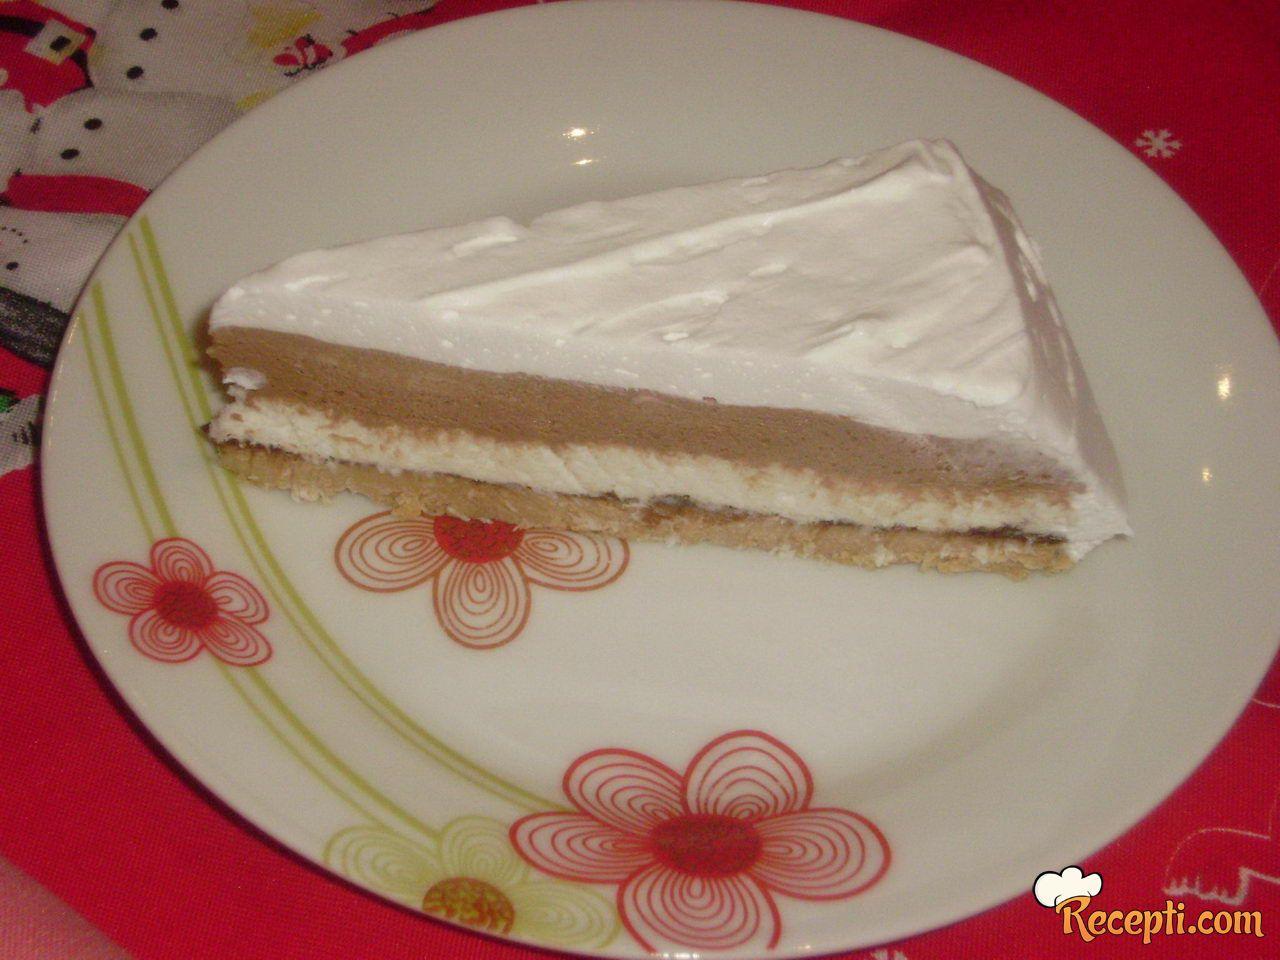 Čoko koko cheesecake